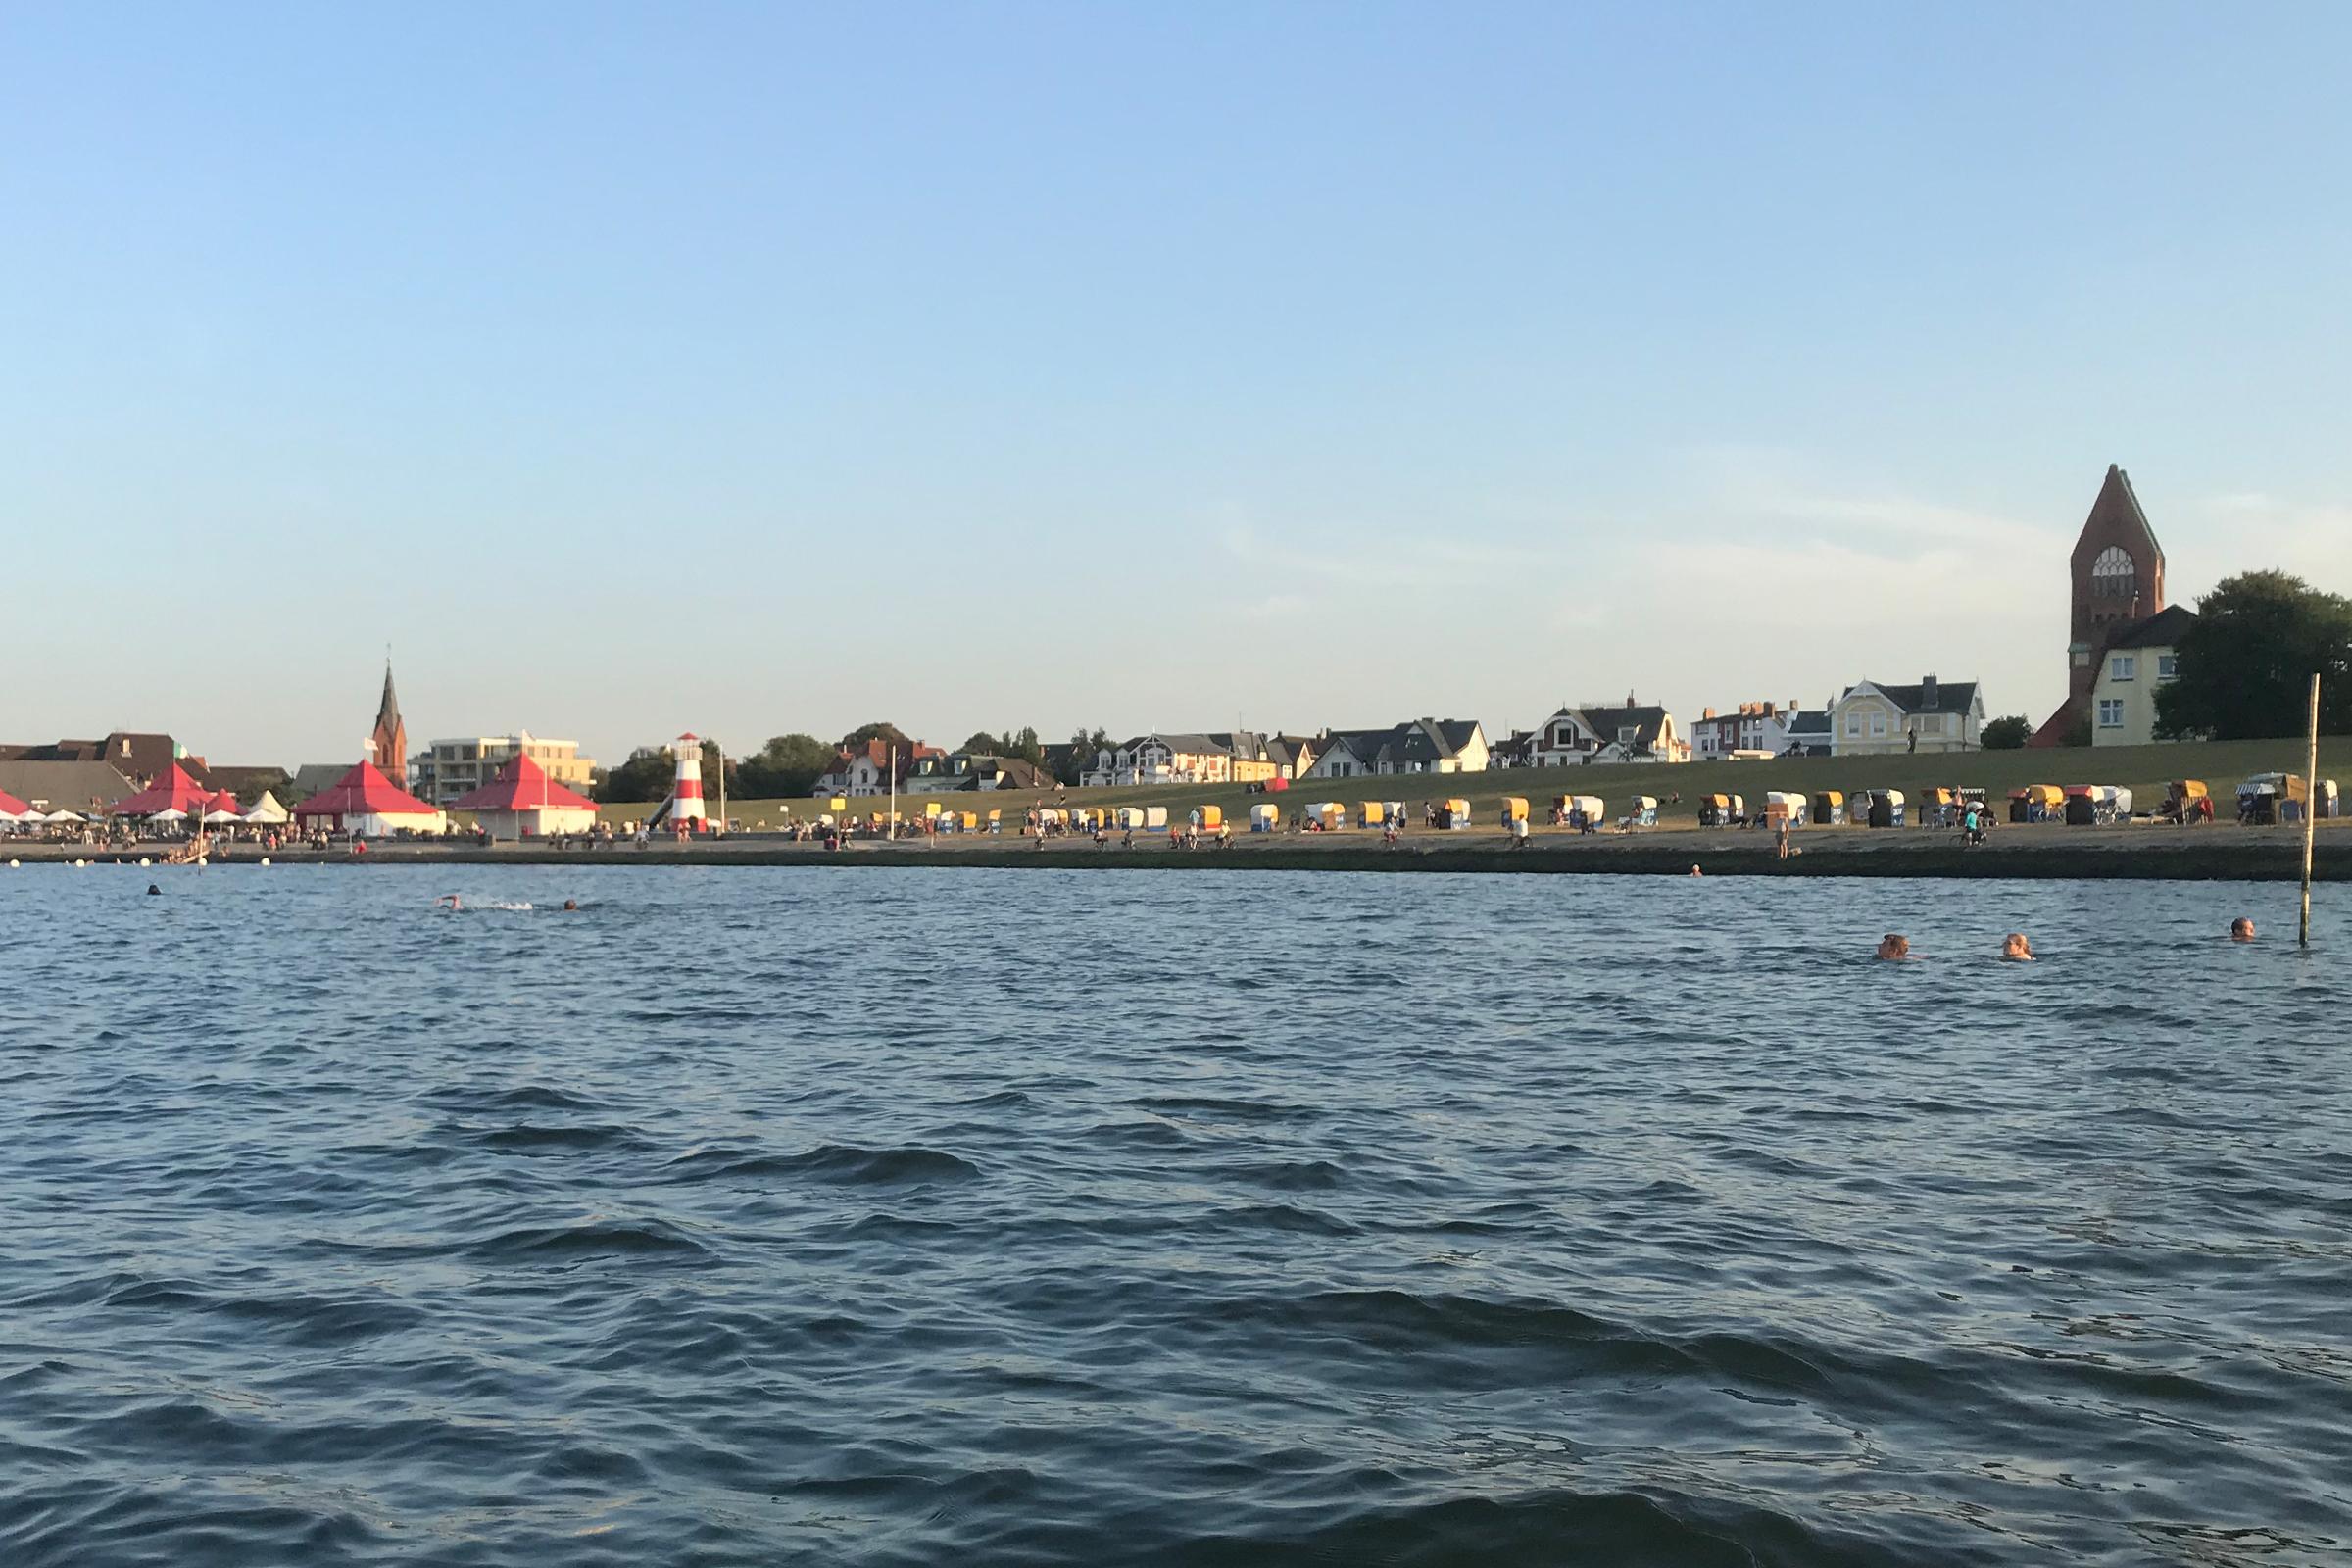 Villa Caldera und Hus Kiek in de See Cuxhaven